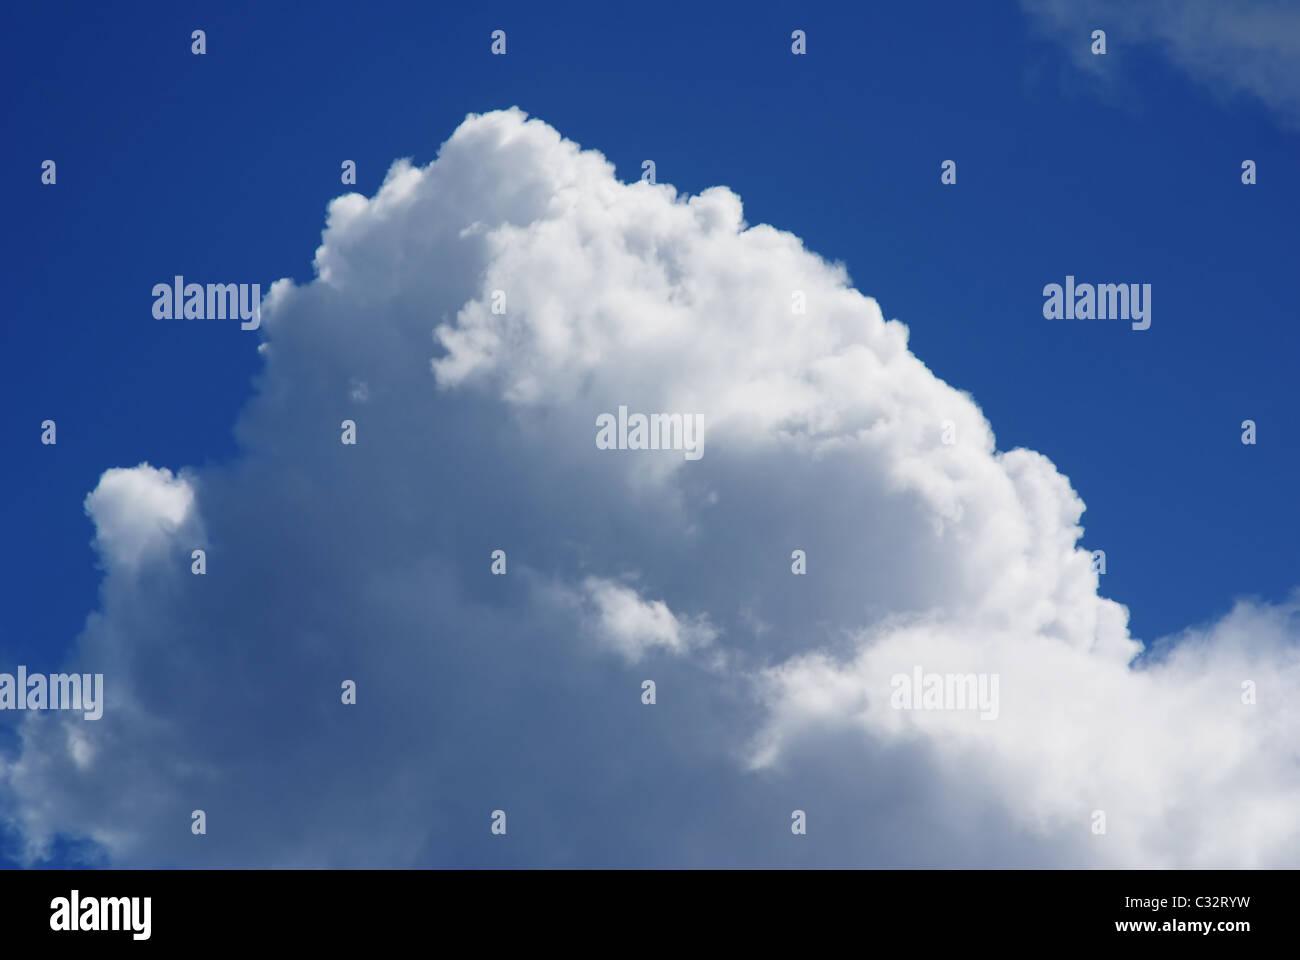 Wunderbaren Wolken gegen blauen Himmel Stockbild